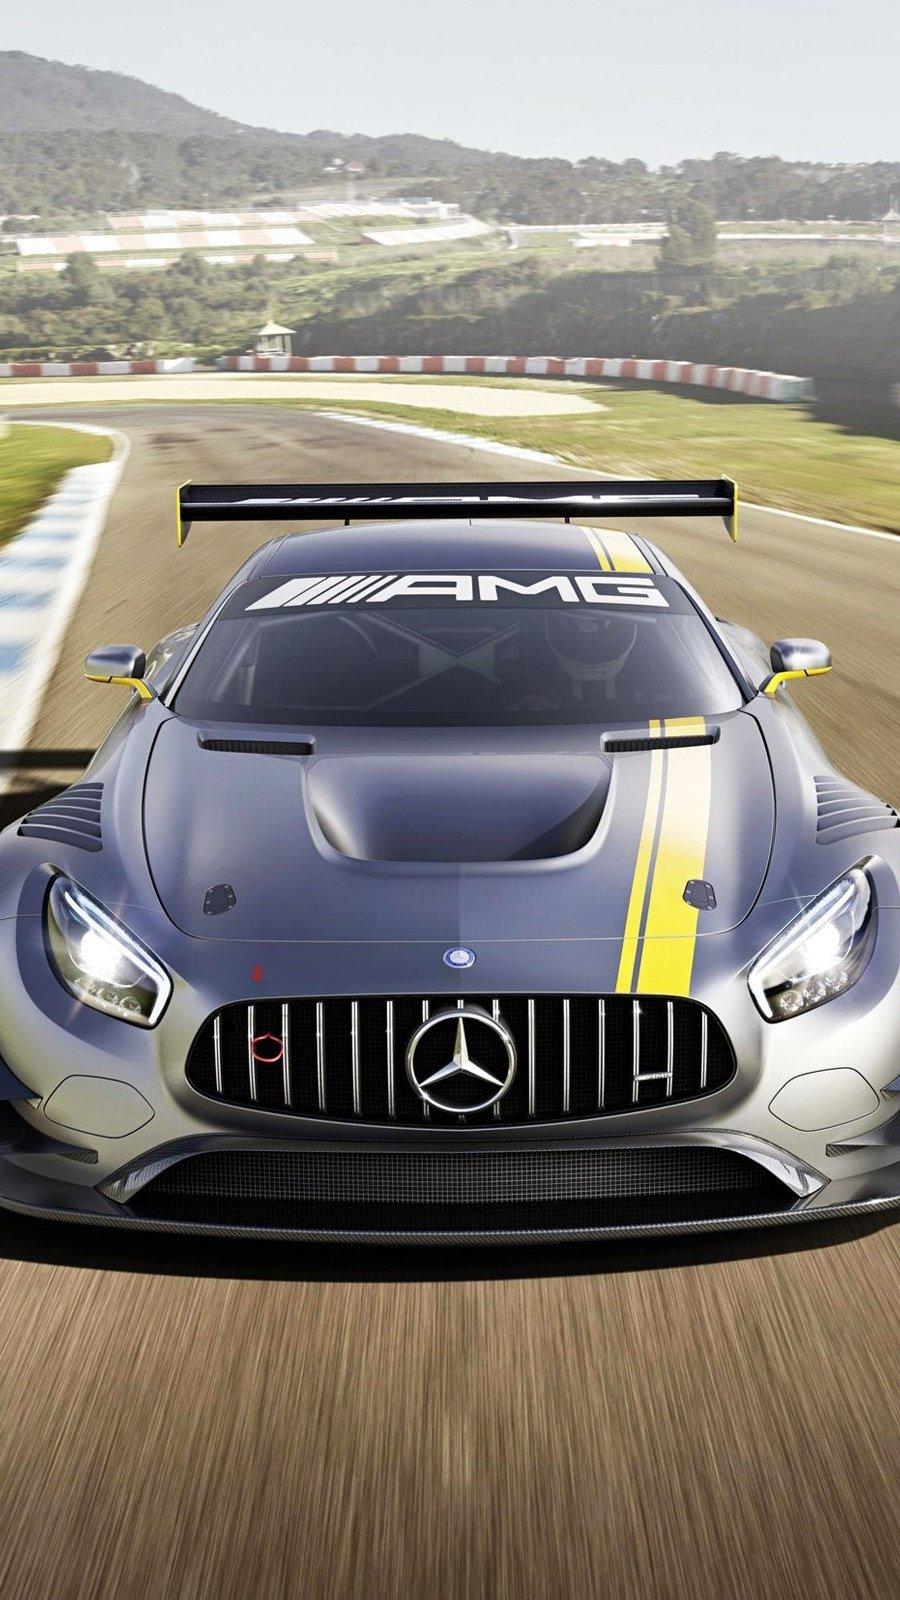 Fondos de pantalla Mercedes Benz AMG GT3 Vertical